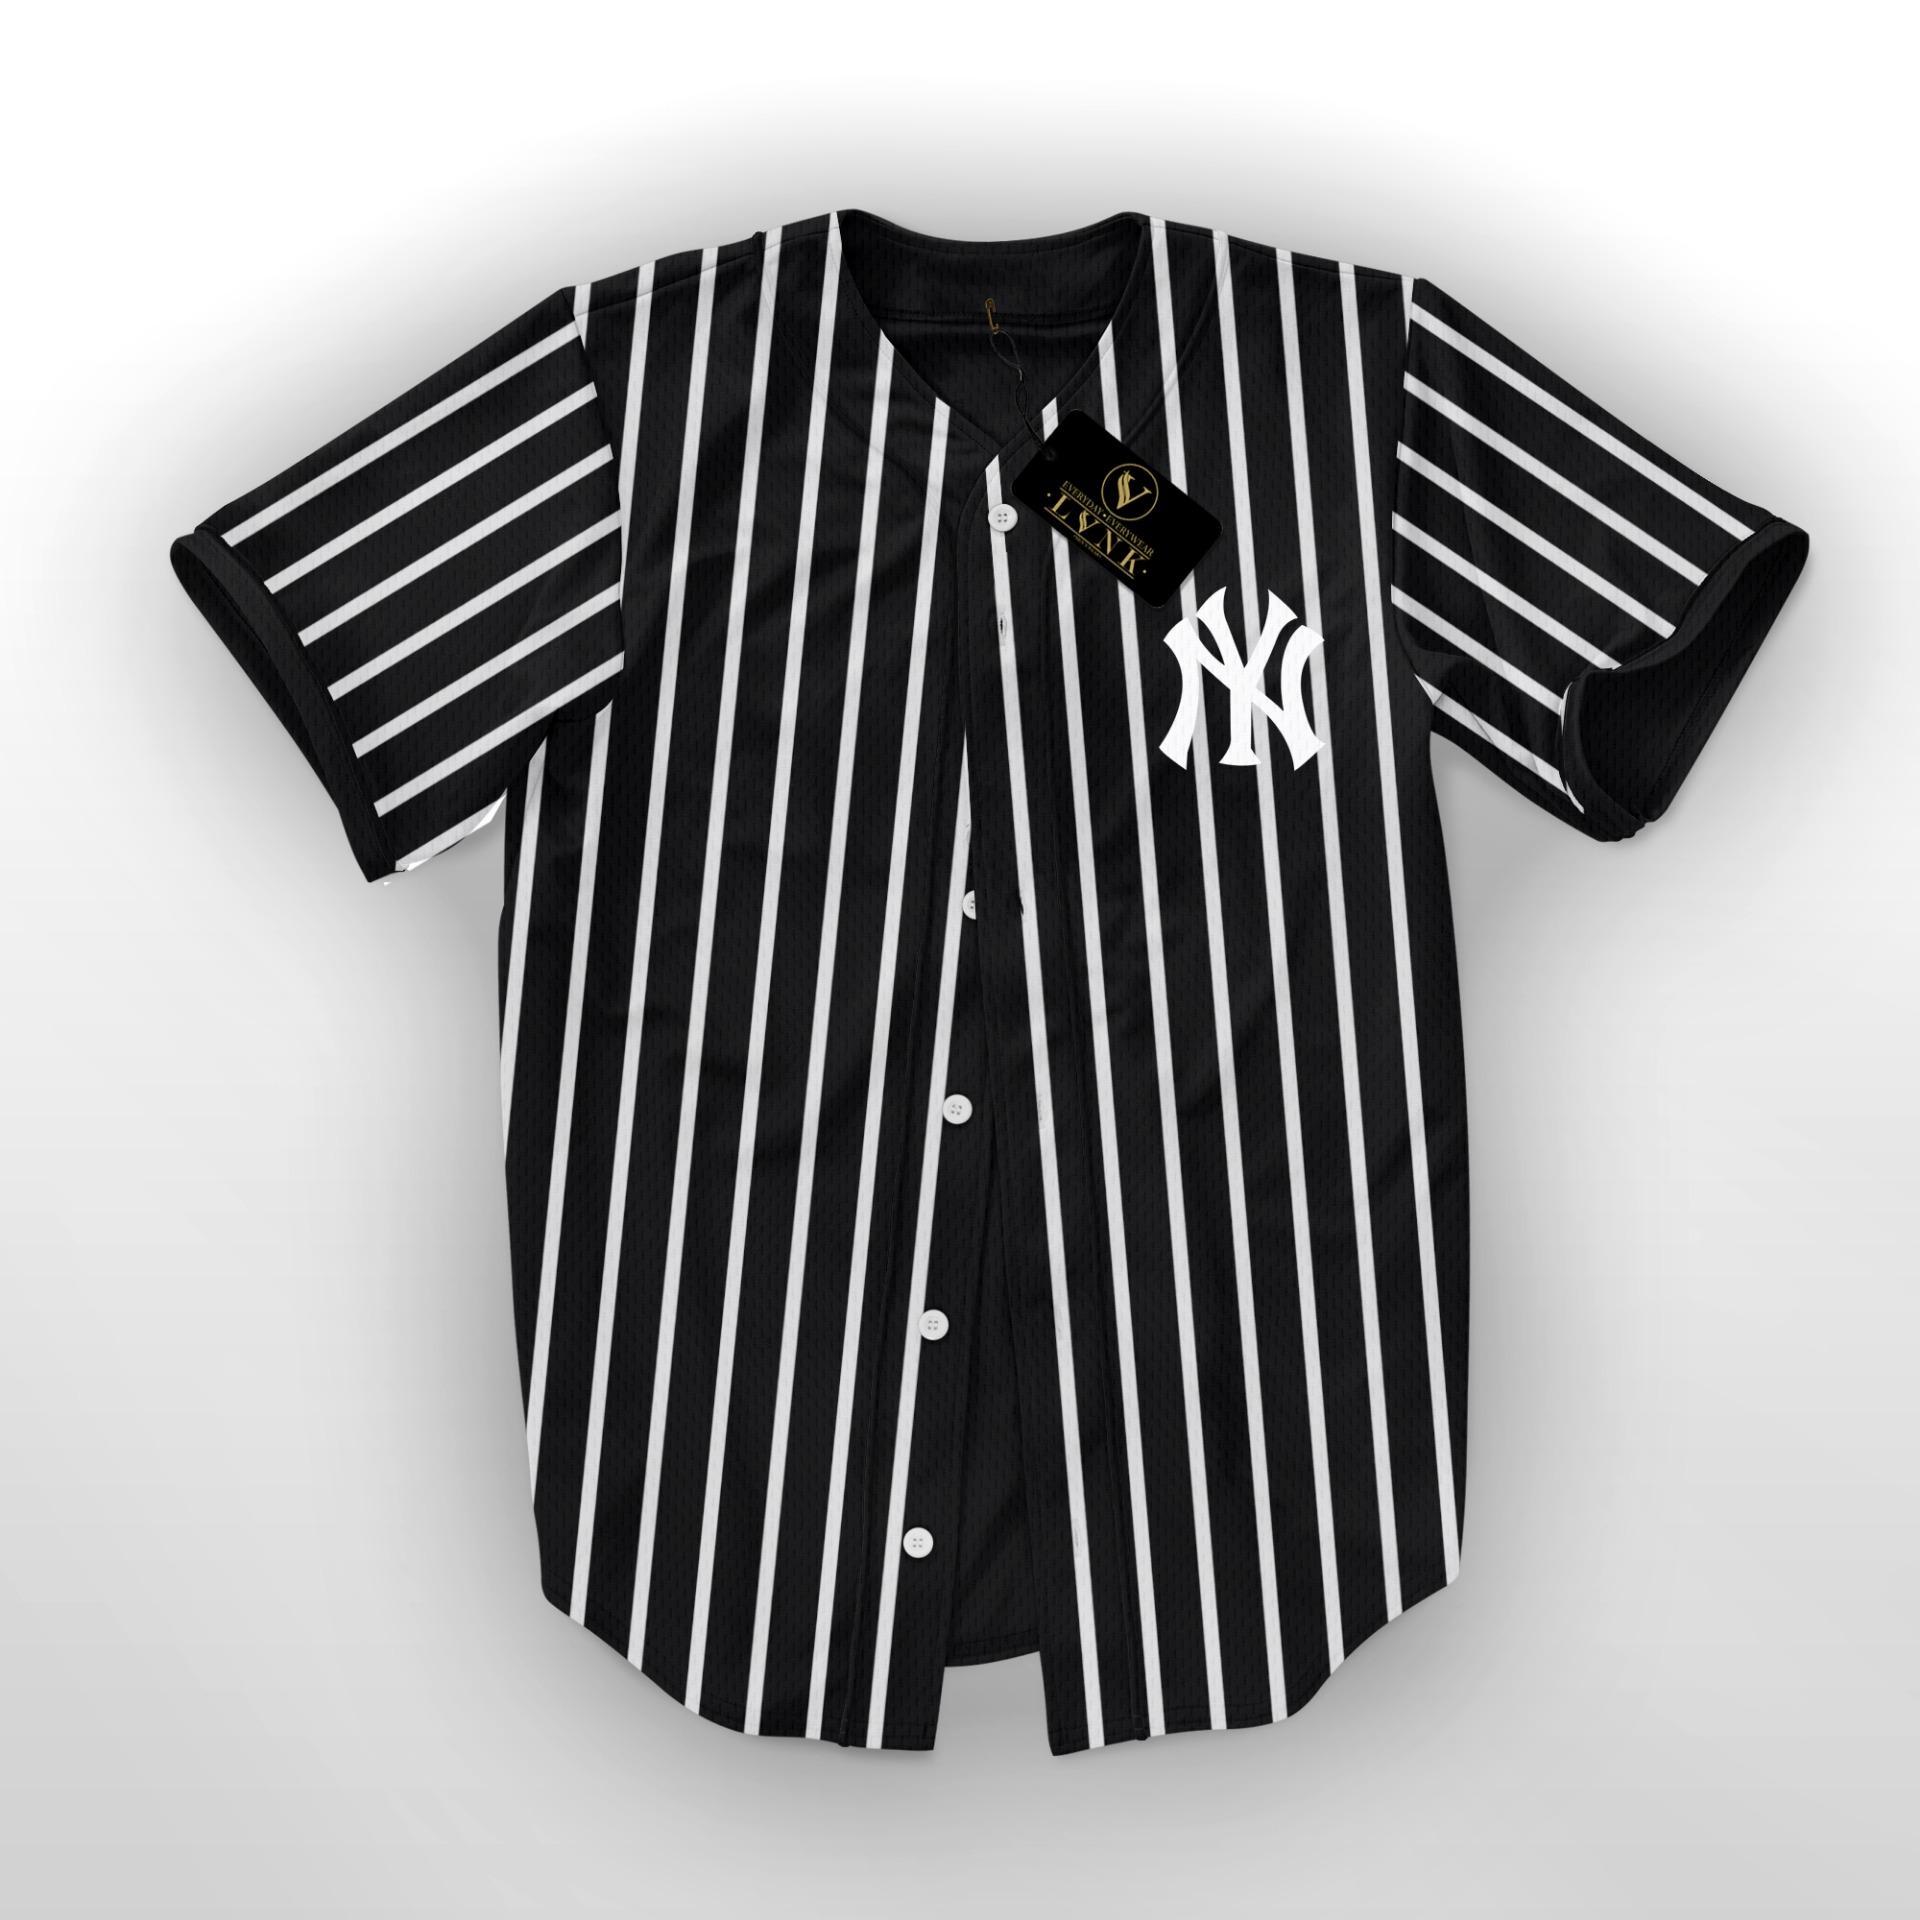 LVNK - Jersey Baseball / Baju Baseball / Baju Hiphop NY Salur Hitam